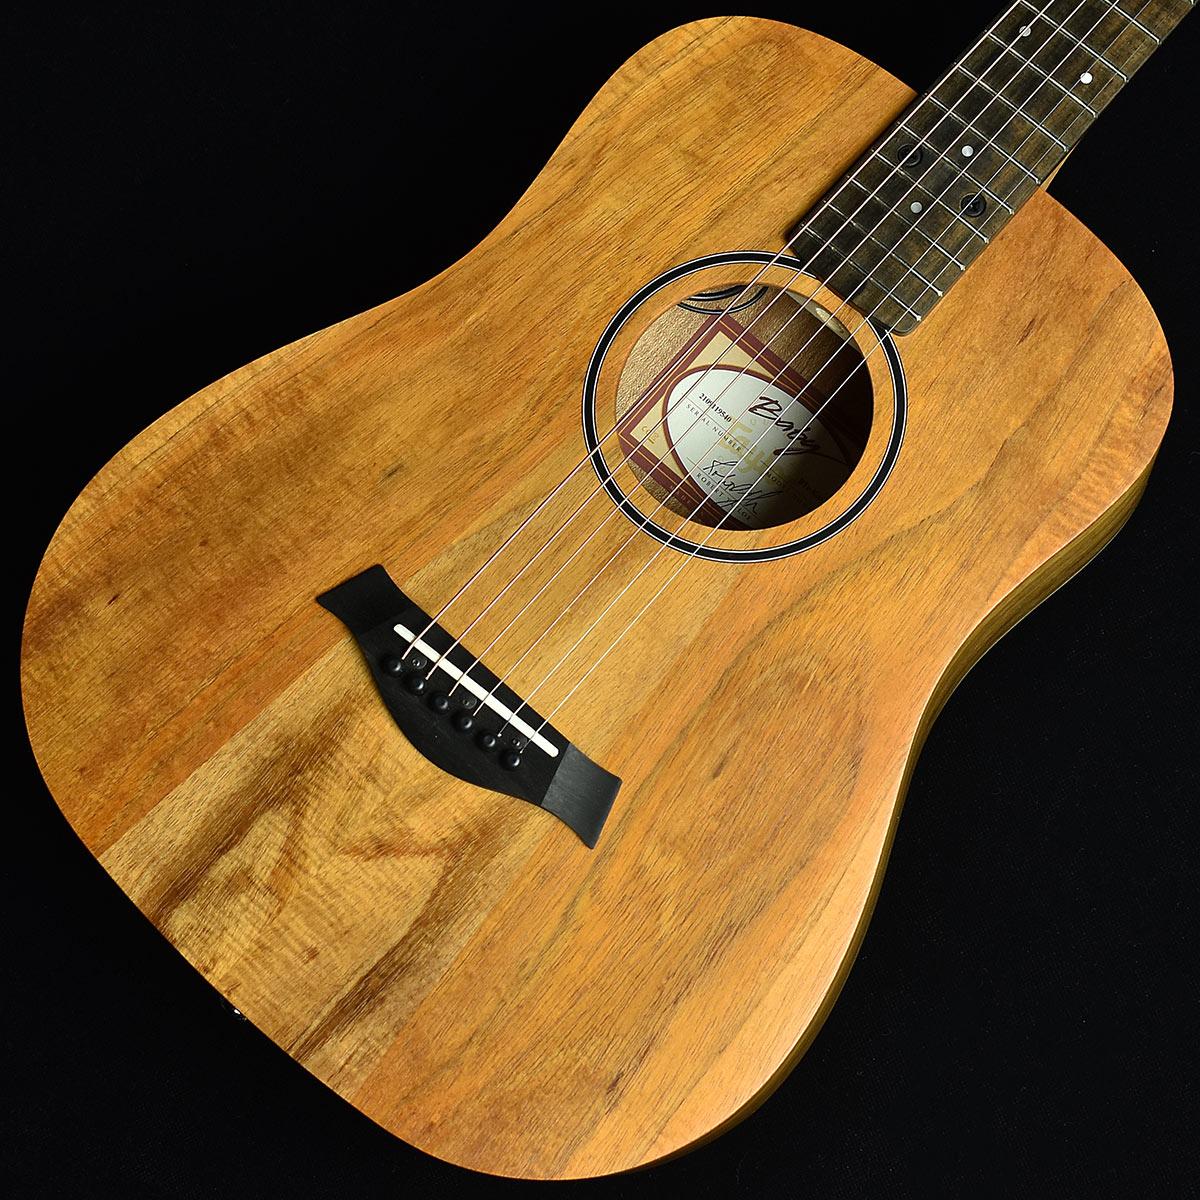 Taylor Baby Taylor-e Koa S/N:2109119540 ミニアコースティックギター【エレアコ】 【テイラー】【未展示品】